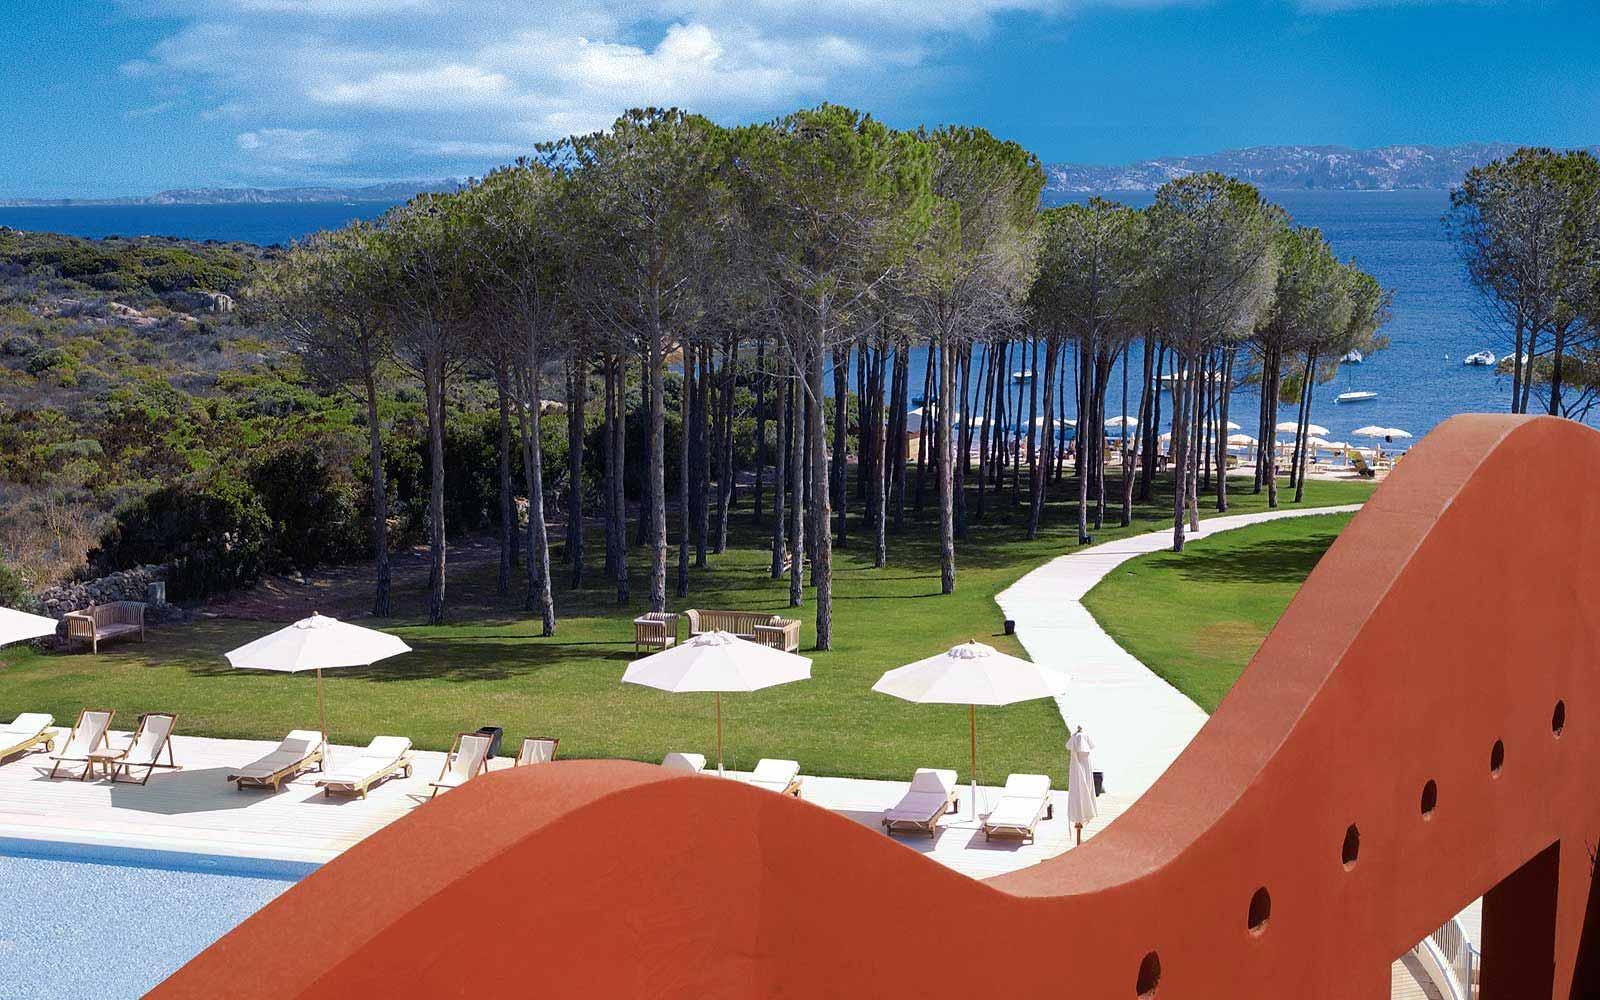 View from a balcony at La Coluccia Hotel & Beach Club